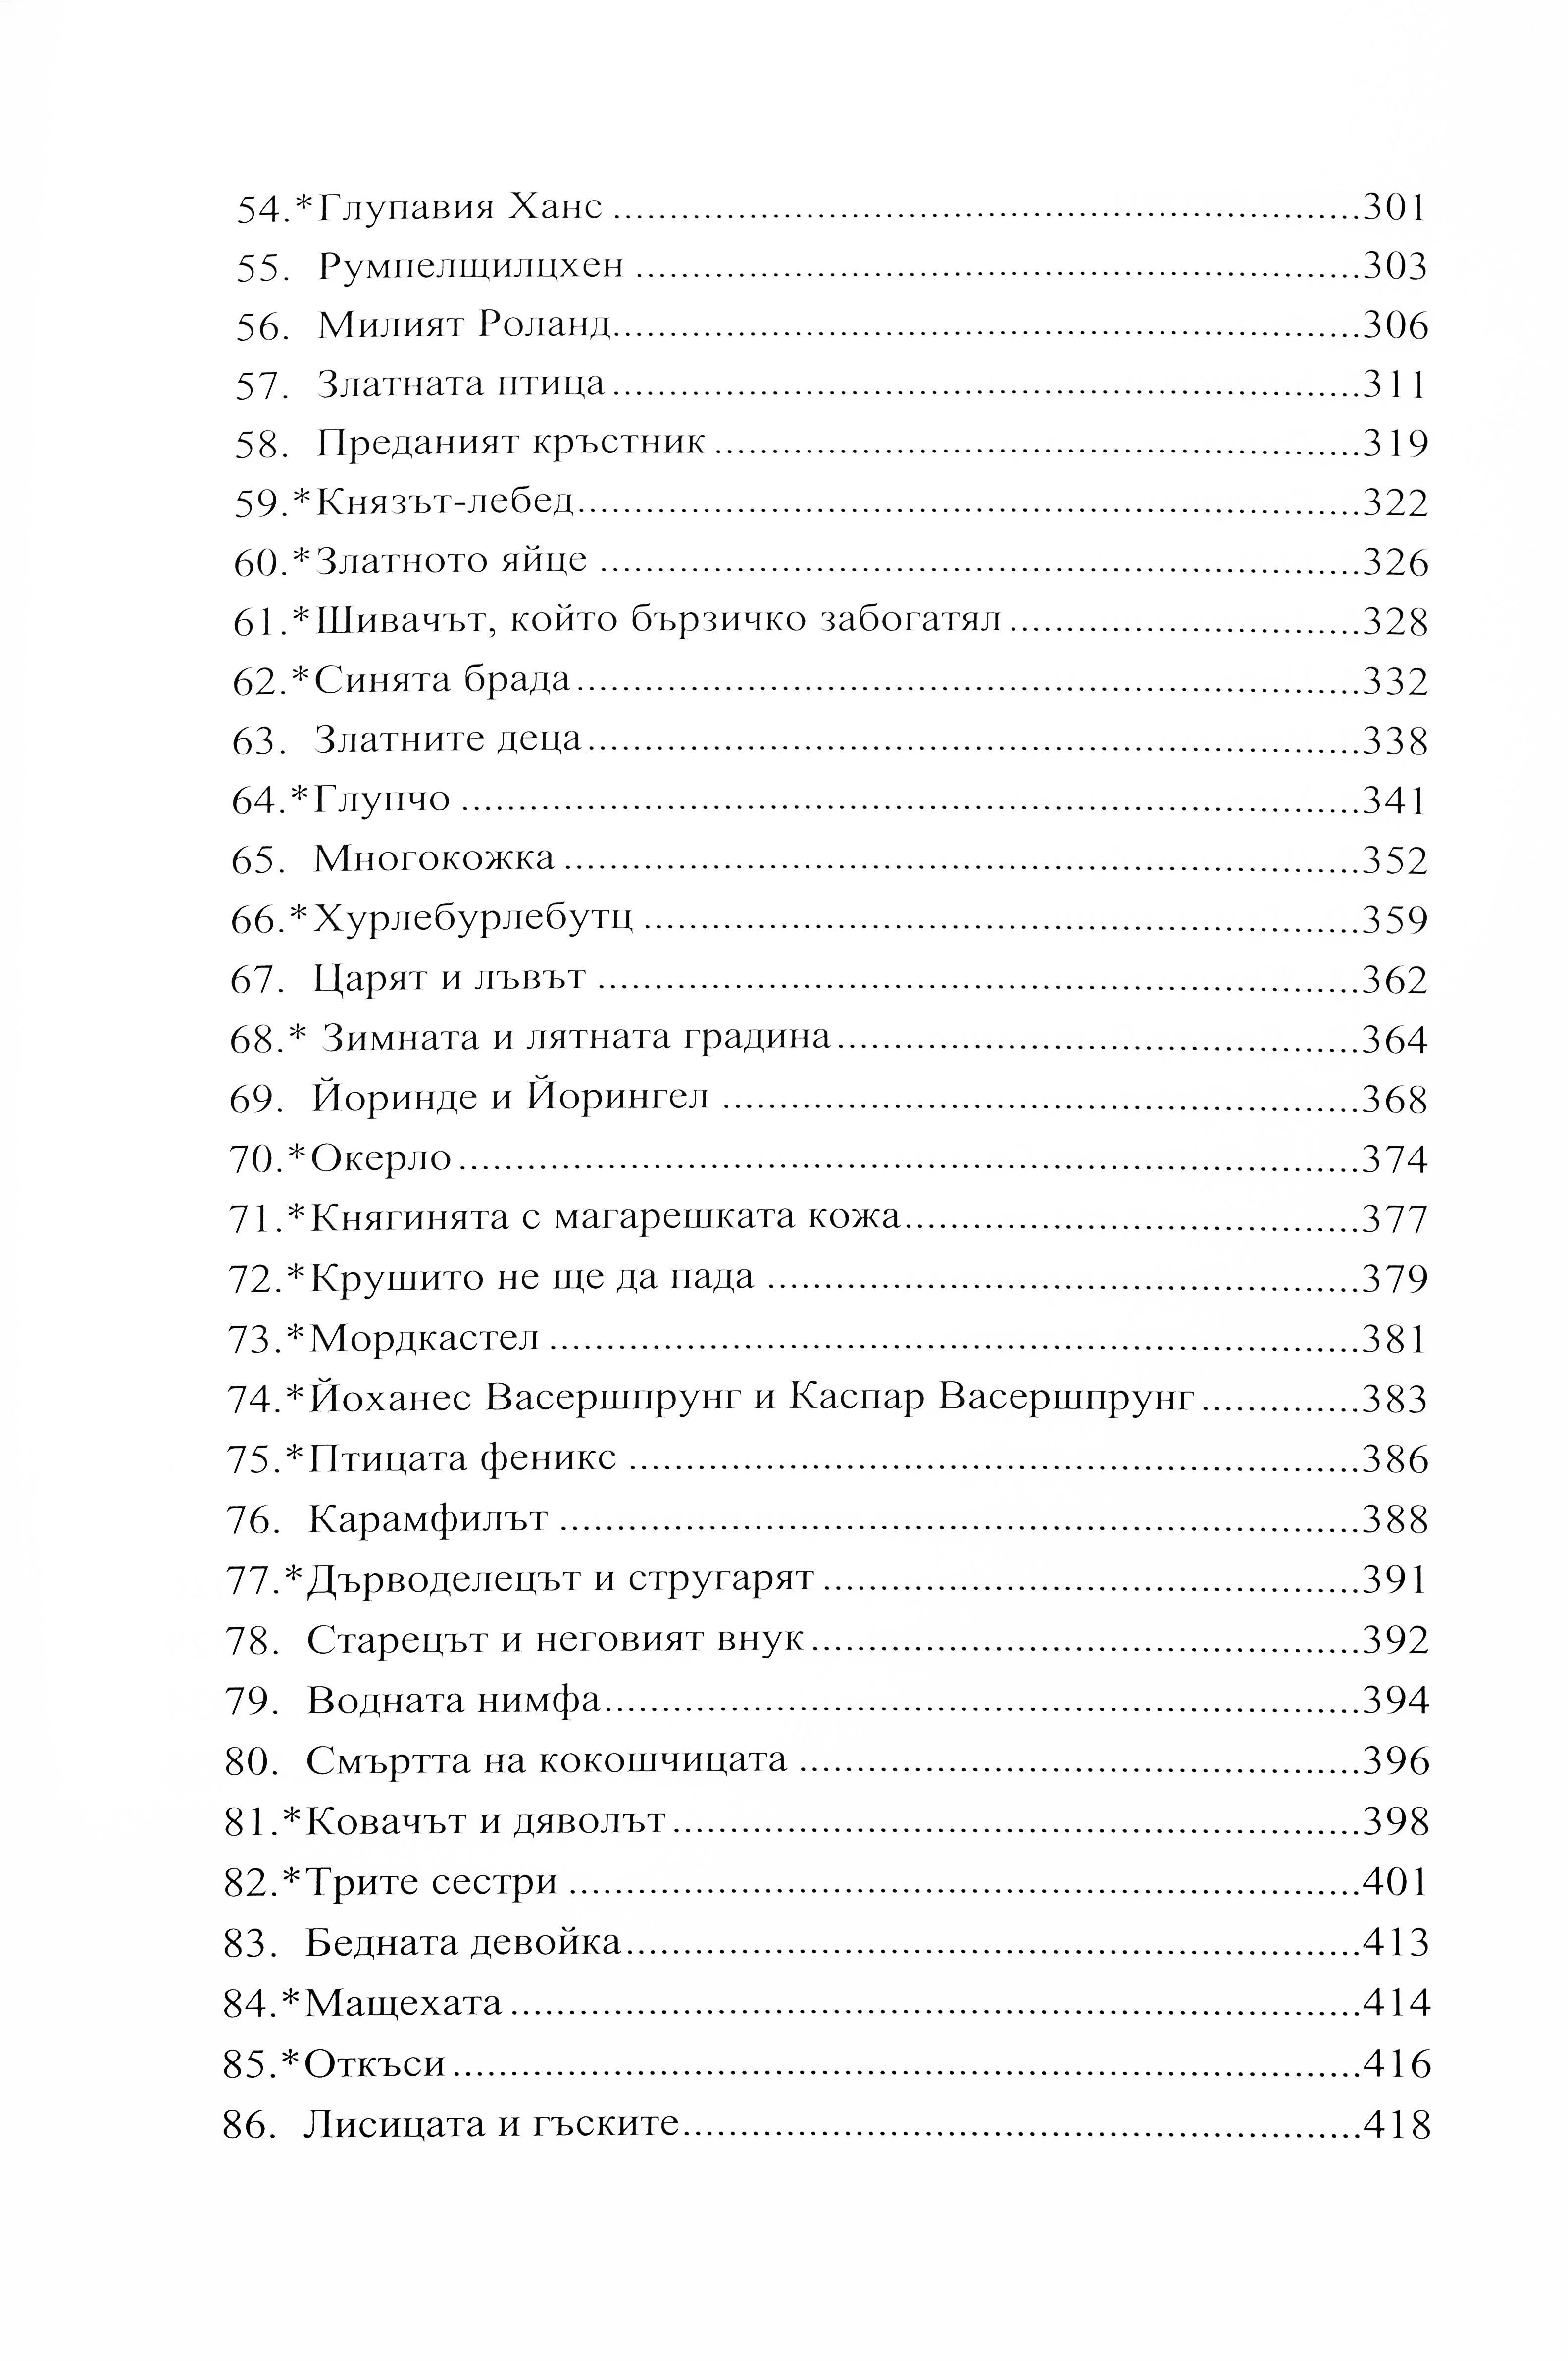 detski-i-domashni-prikazki-tvardi-koritsi-8 - 9